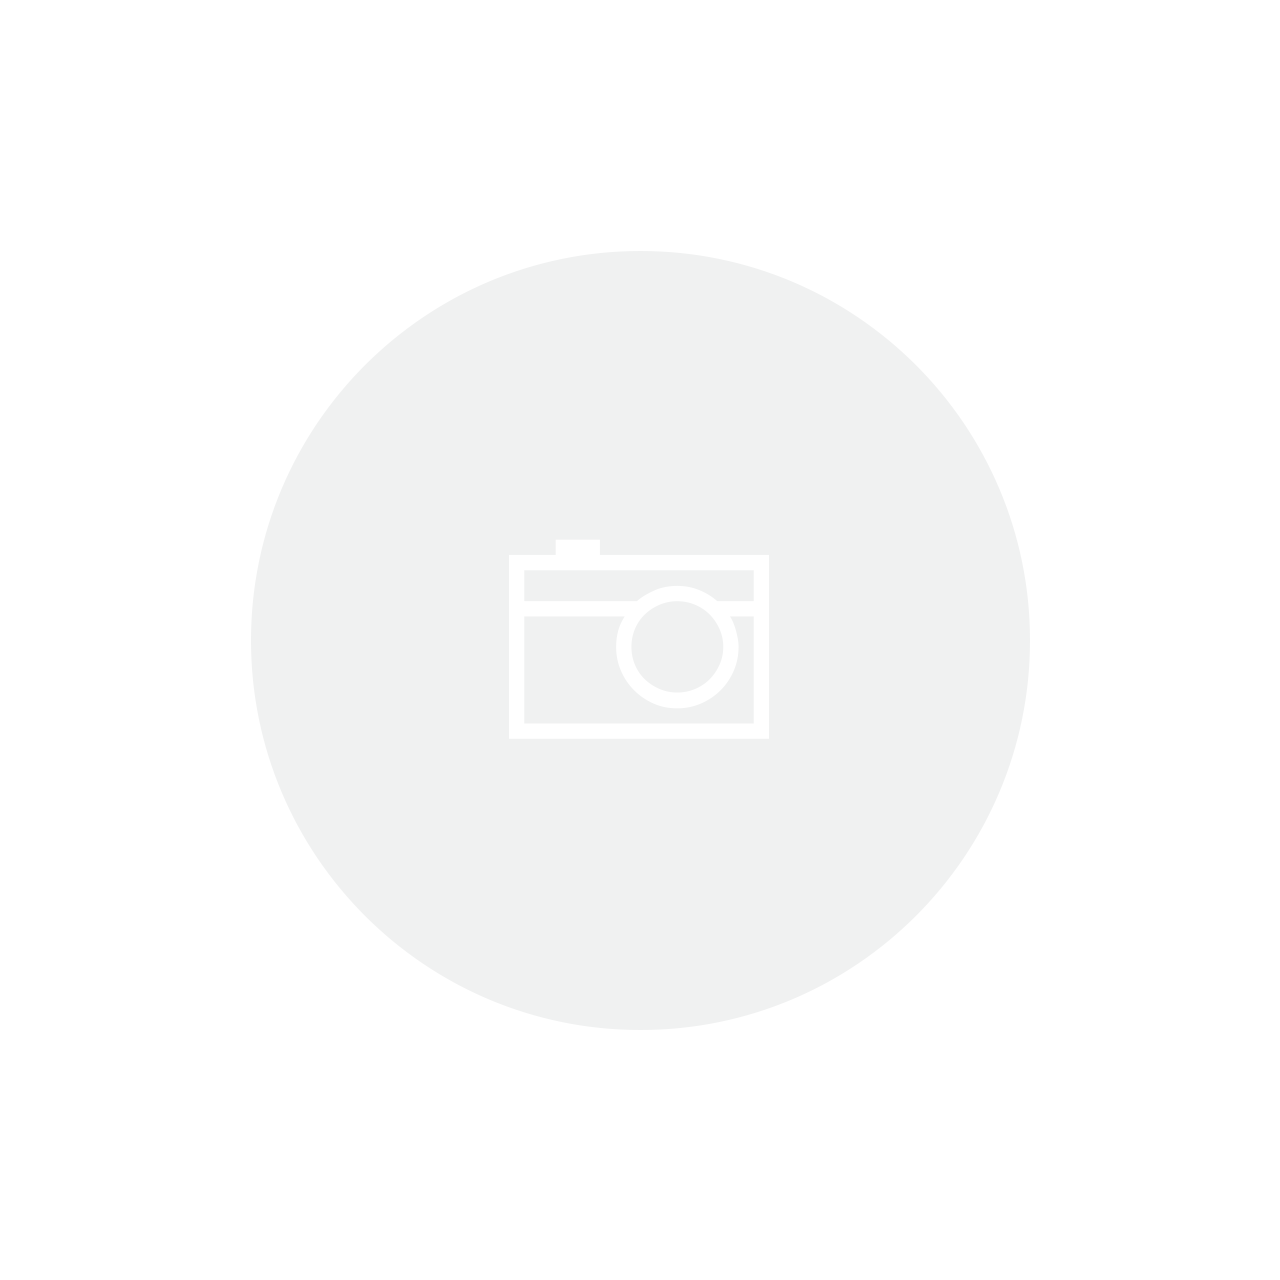 Placa Mãe Gigabyte GA-Z270X-Gaming 7 Aorus RGB - LGA1151